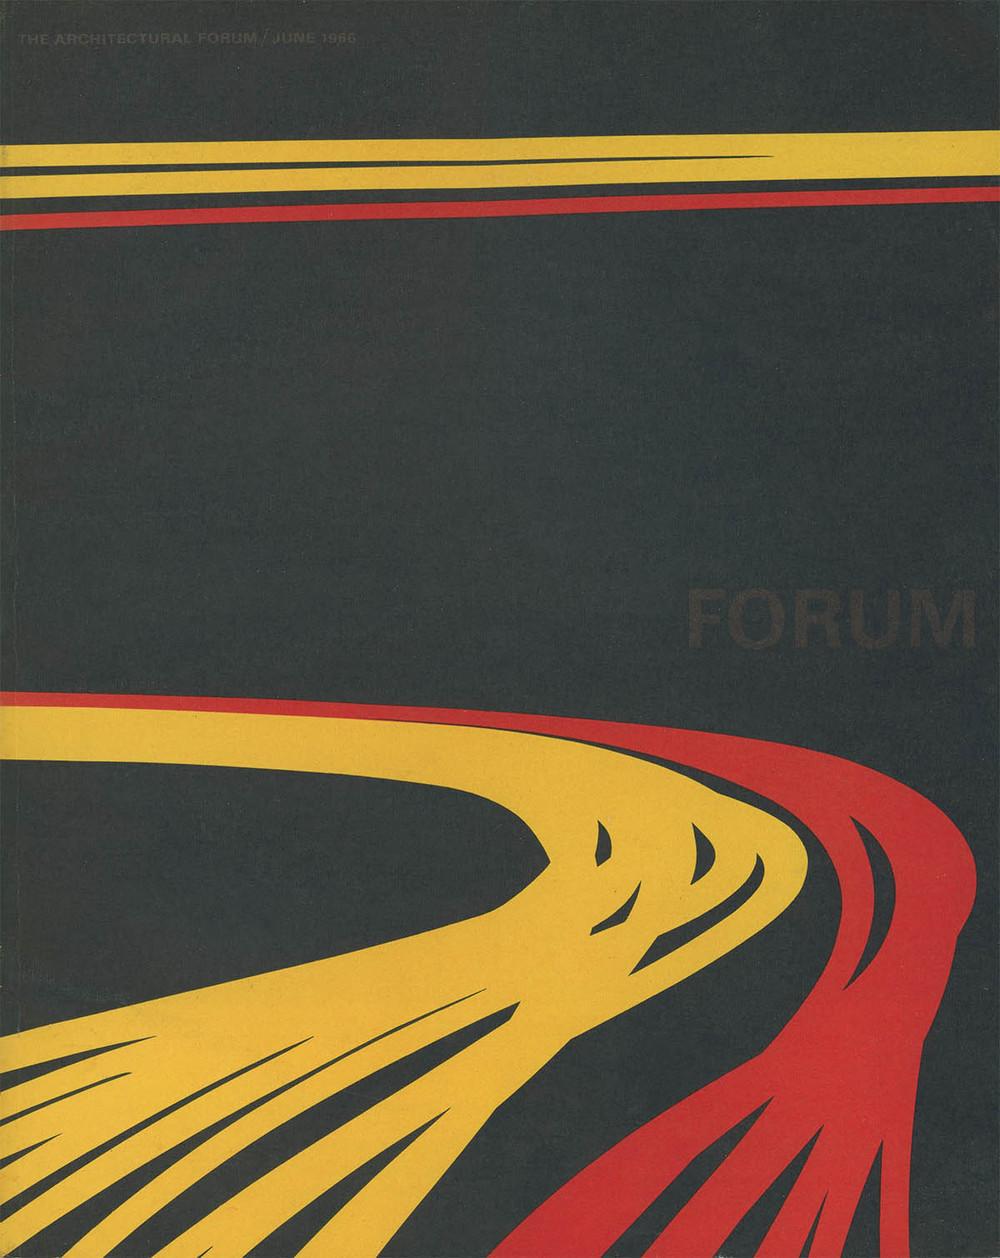 Paul Grotz,Peter Bradford, Architectural Forum, 1966